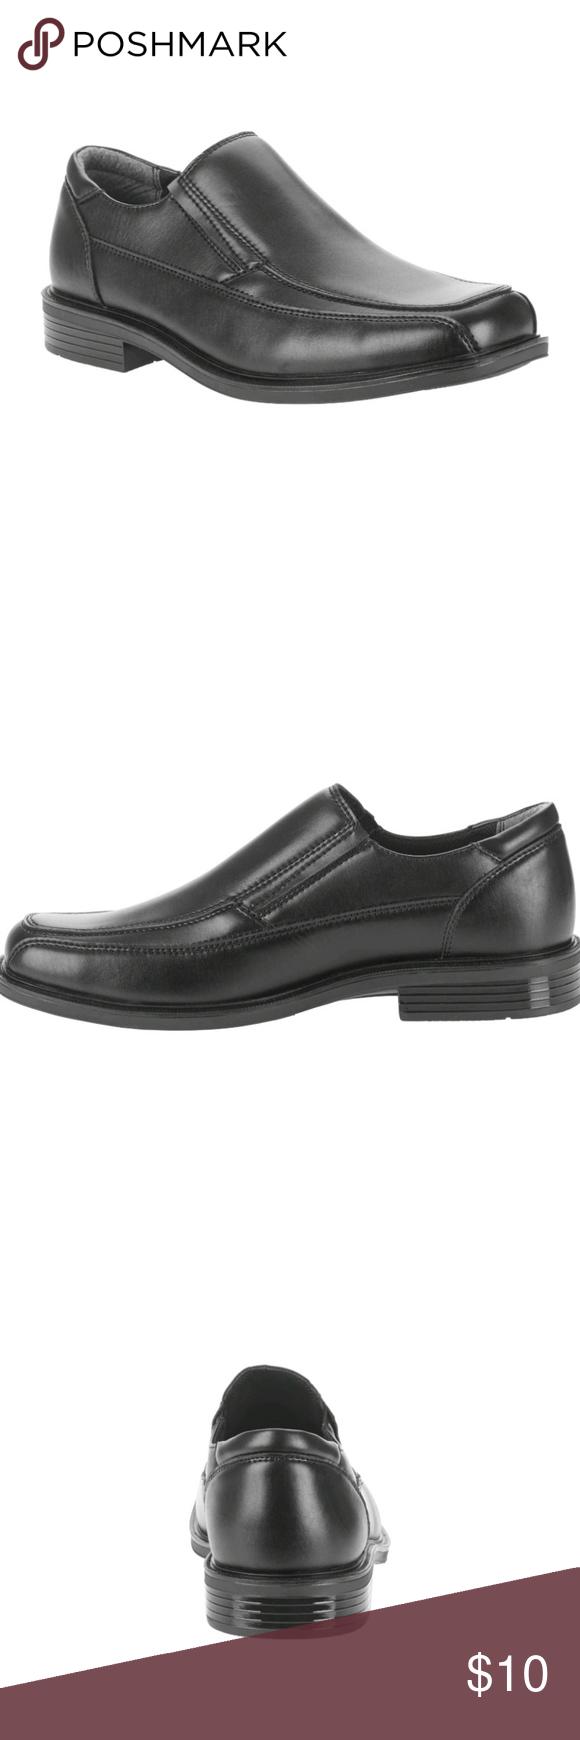 244f1d0f2b3b2a GEORGE Mens Dress Shoes Size 8 George Mens Metropolis Dress Shoes